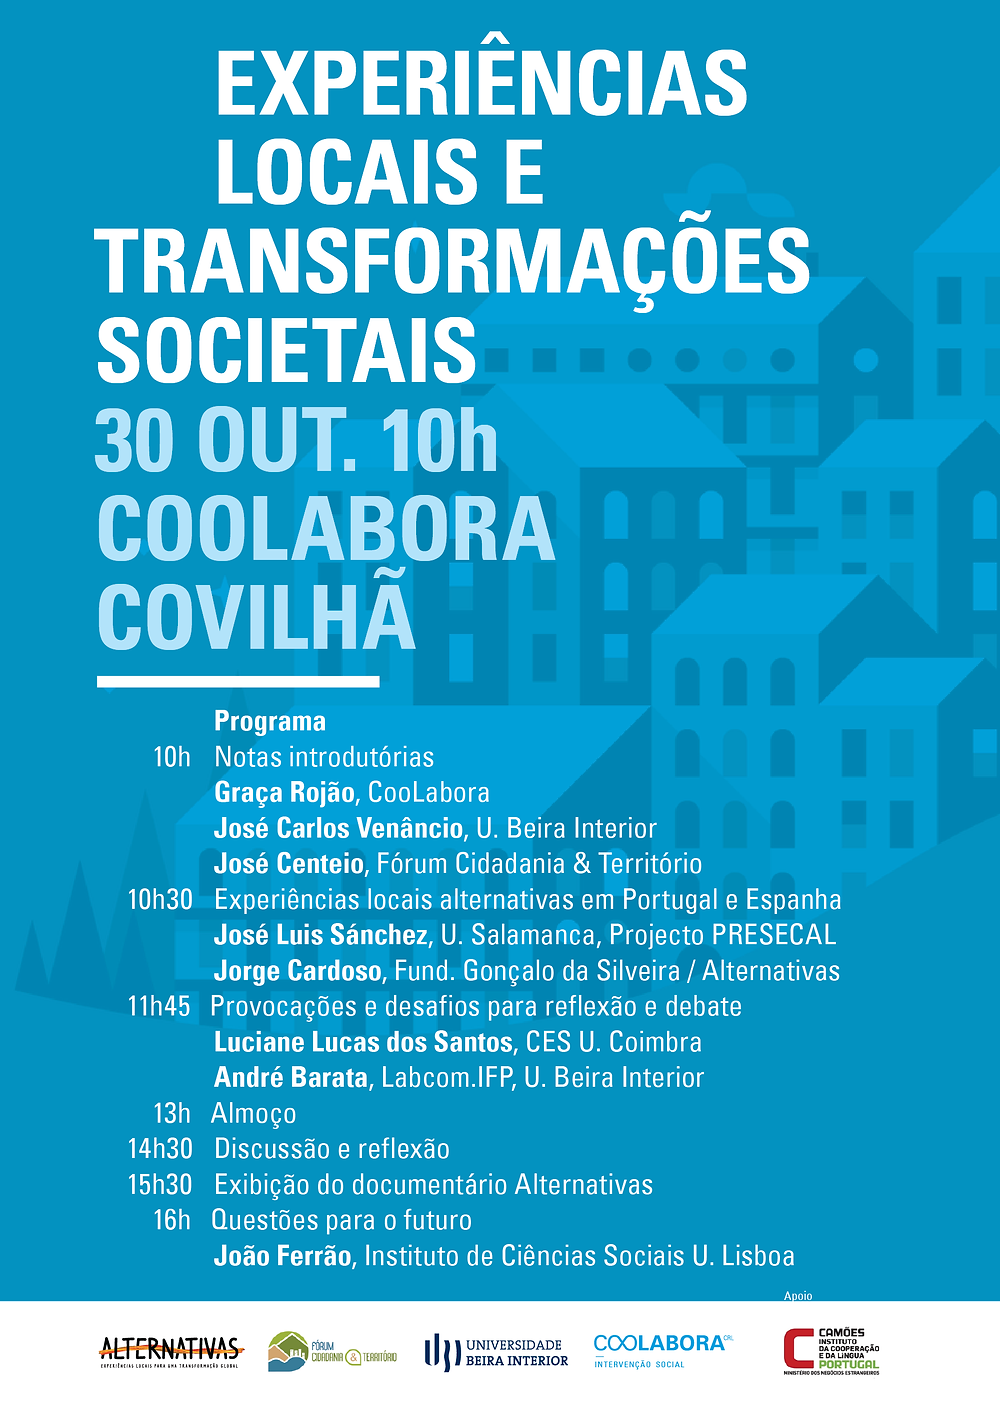 30 OUT. 10h | COOLABORA | COVILHÃ